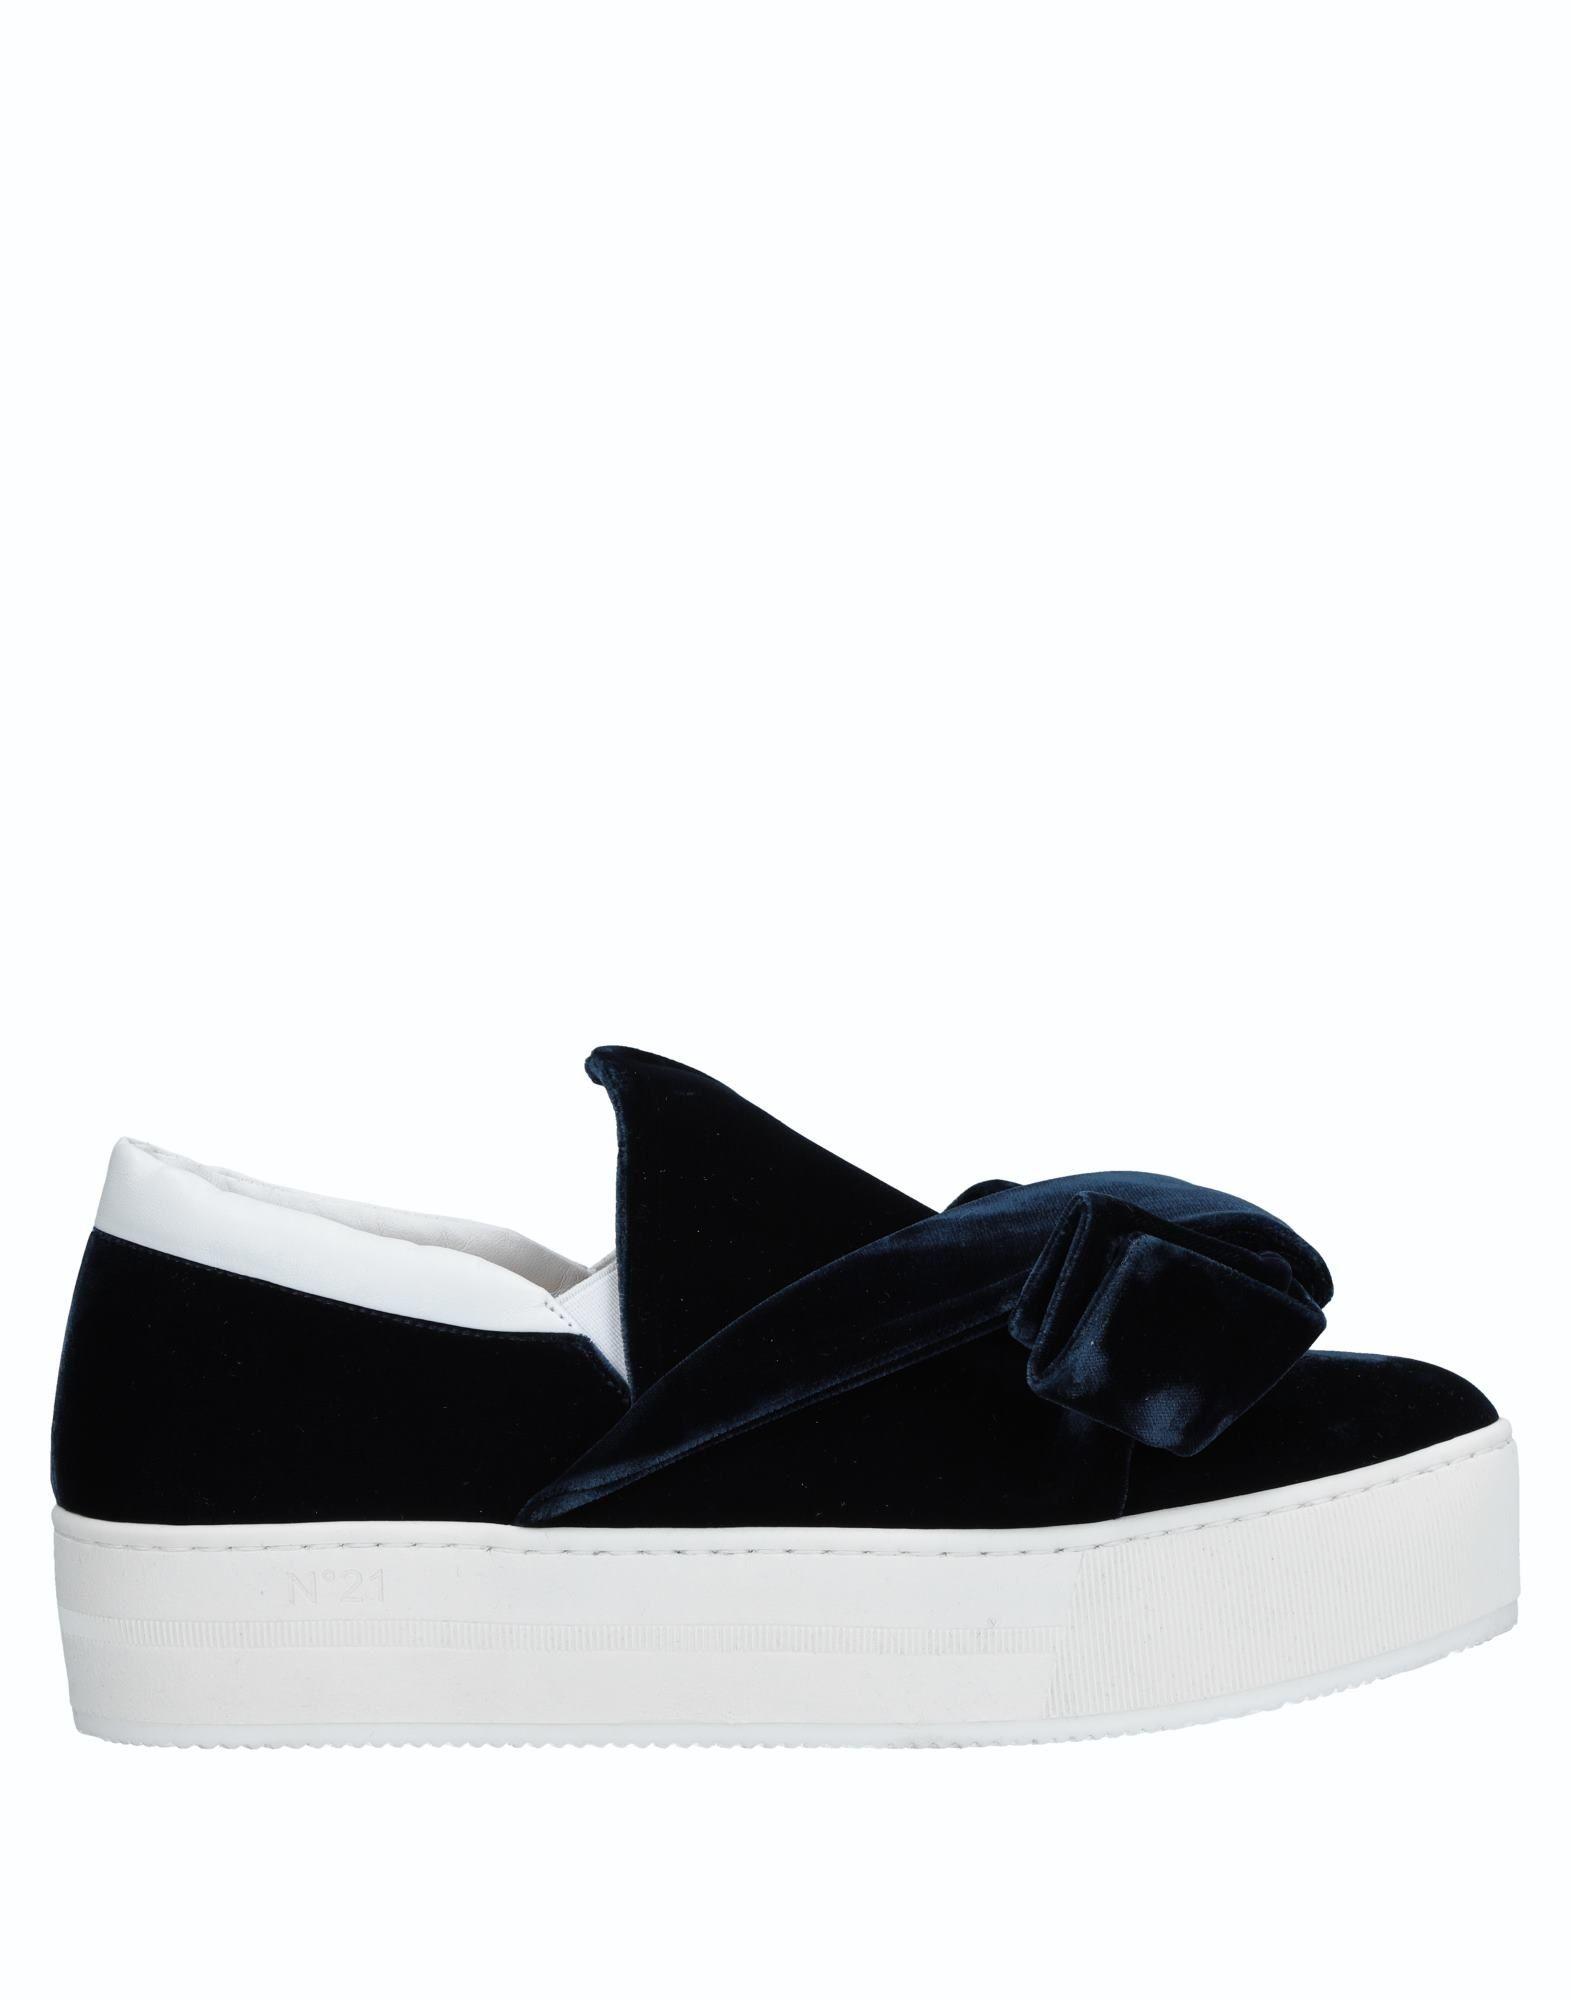 N° 21 Sneakers Damen  11481361UWGut aussehende strapazierfähige Schuhe